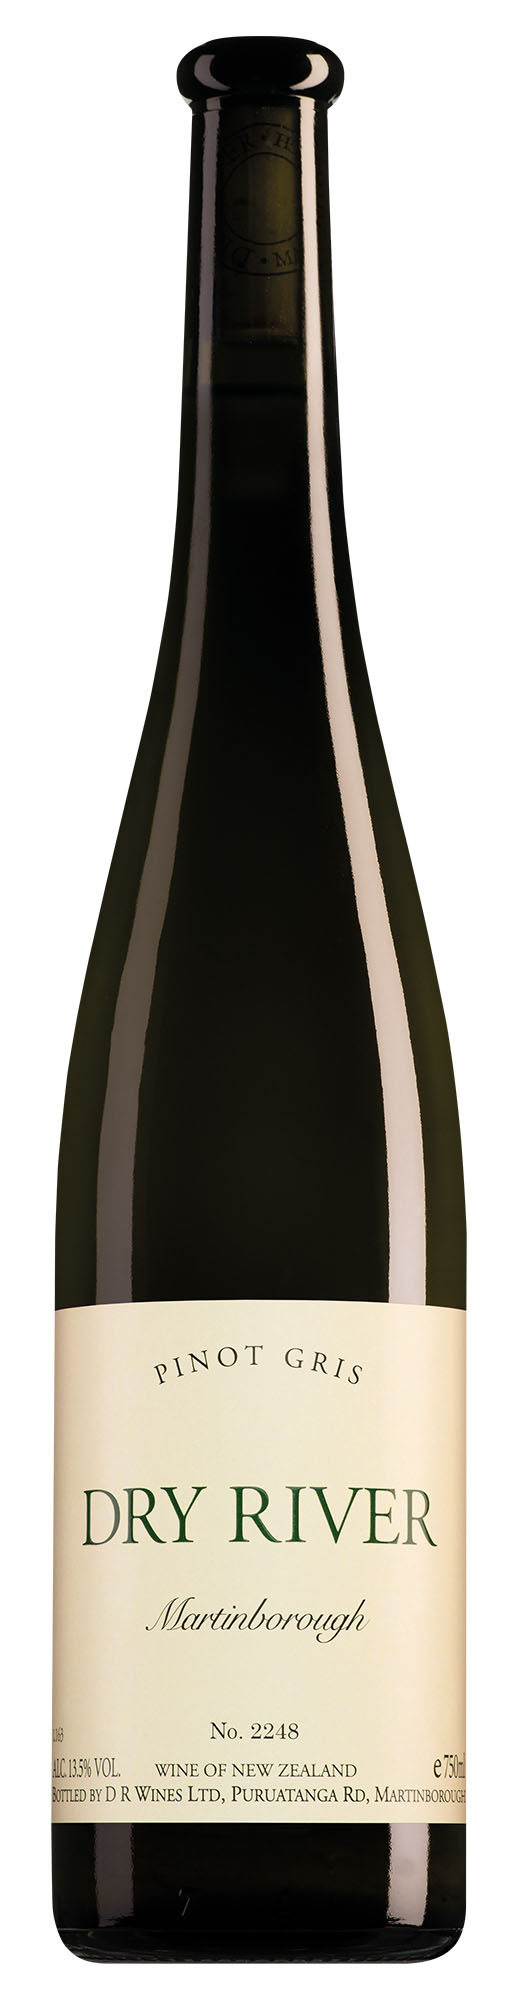 Dry River Martinborough Pinot Gris